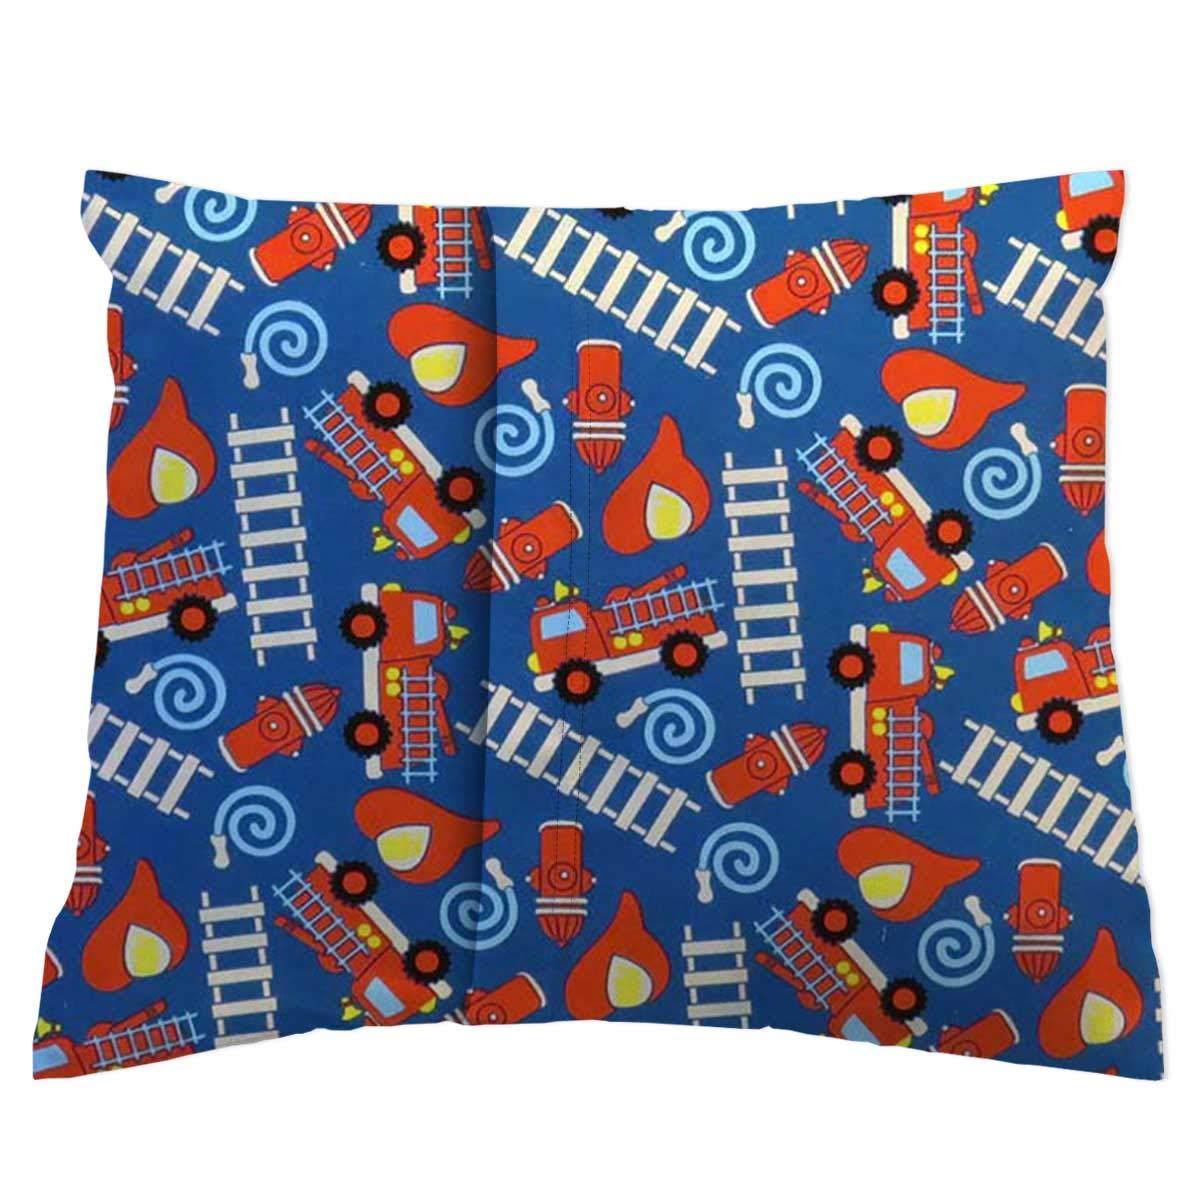 Fire Trucks Blue 13 x 17 100/% Cotton Woven Made in USA SheetWorld Crib Toddler Pillow Case